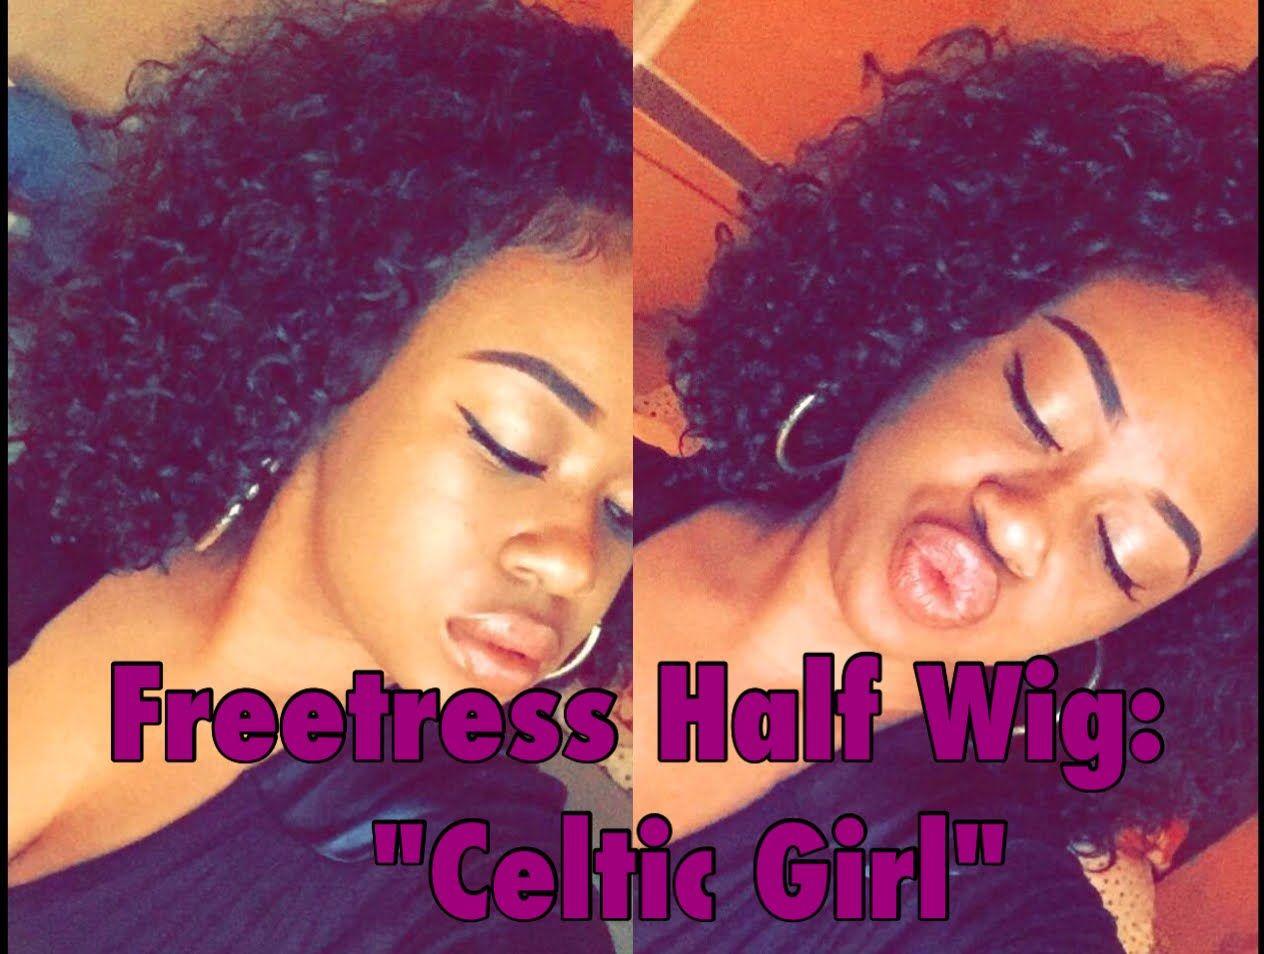 [BALL ON A BUDGET/ Wig under $50] Freetress Celtic Girl Half Wig + Let's...